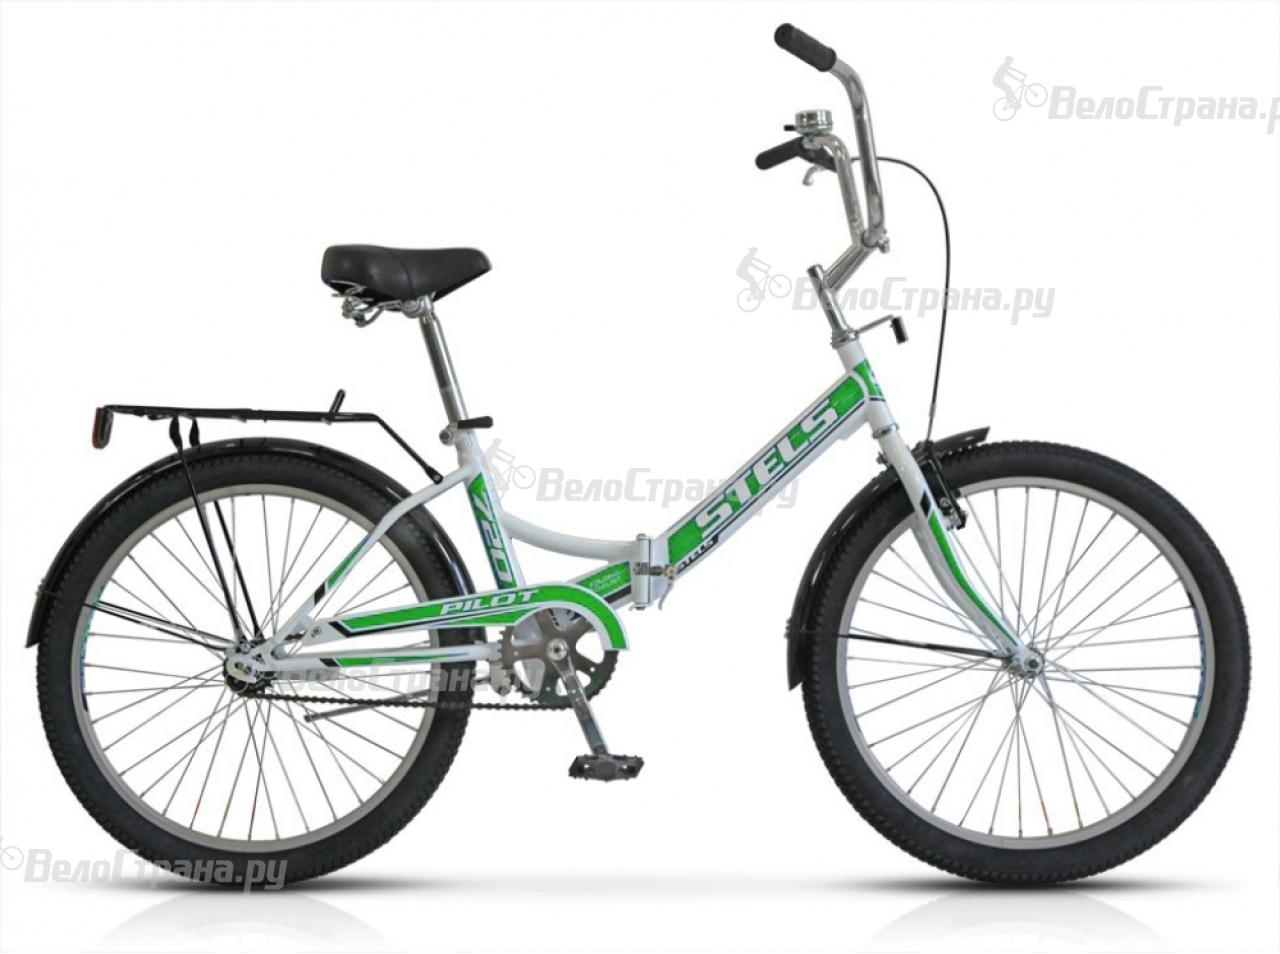 Велосипед Stels Pilot 720 (2013) велосипед stels navigator 310 2016